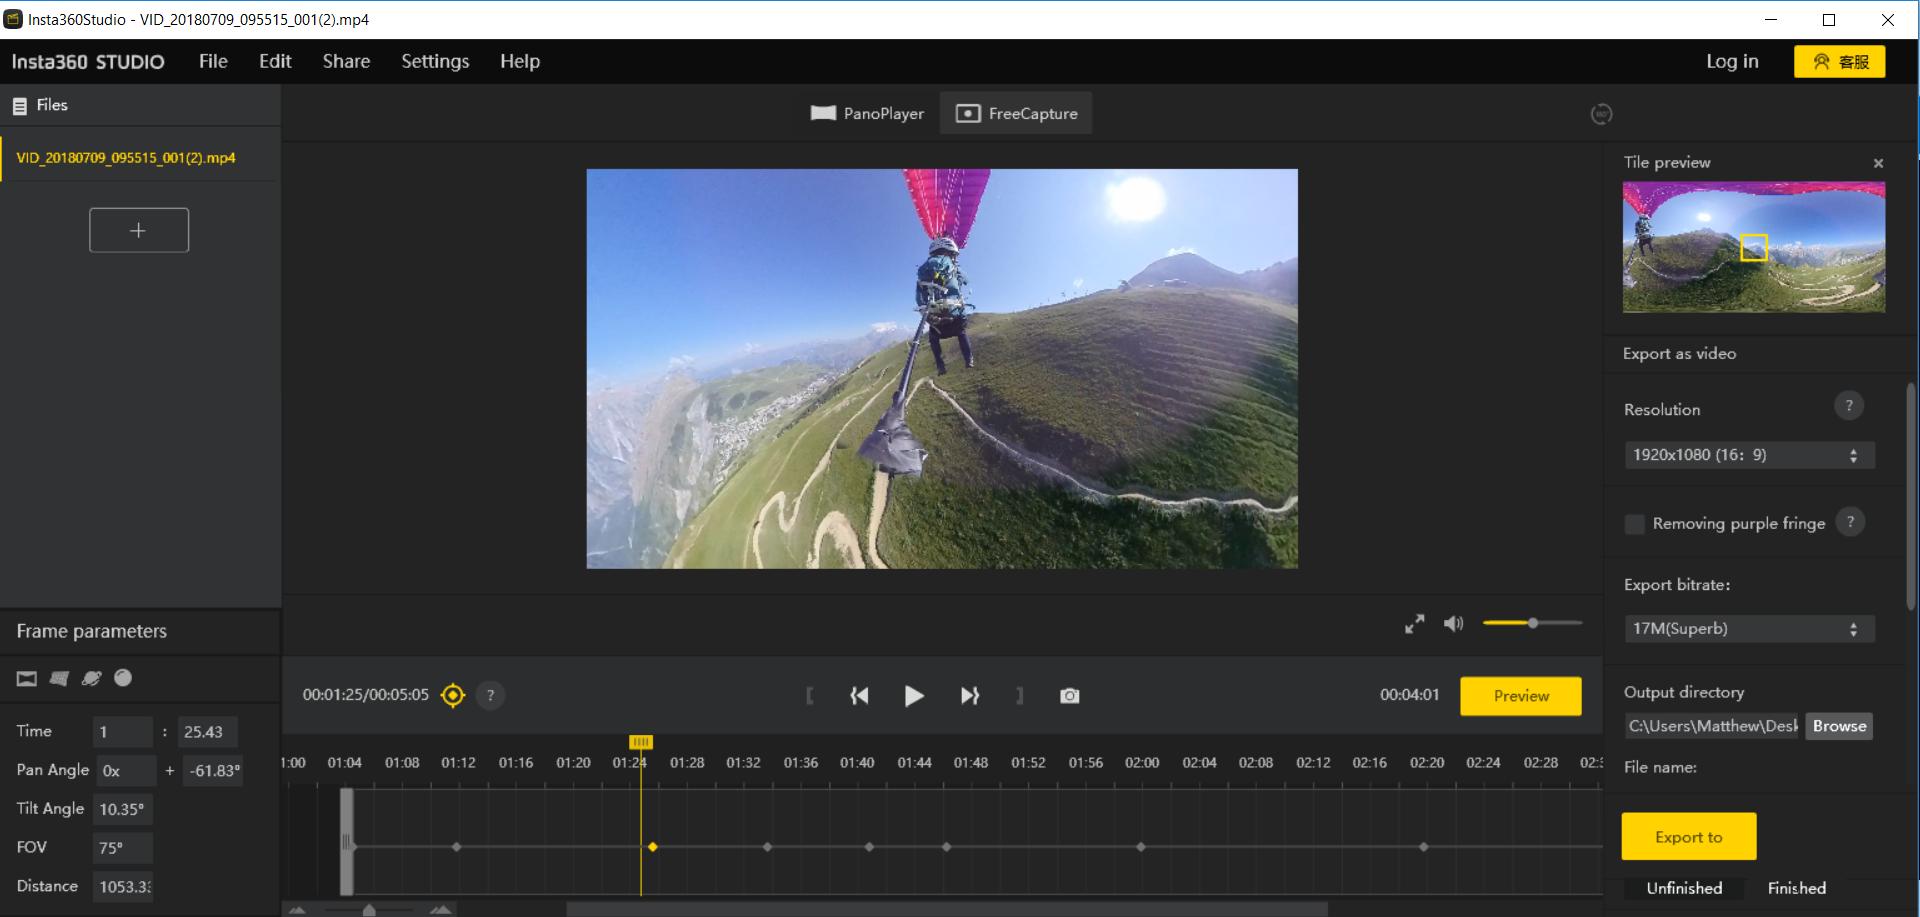 Insta360 Studio Screenshot